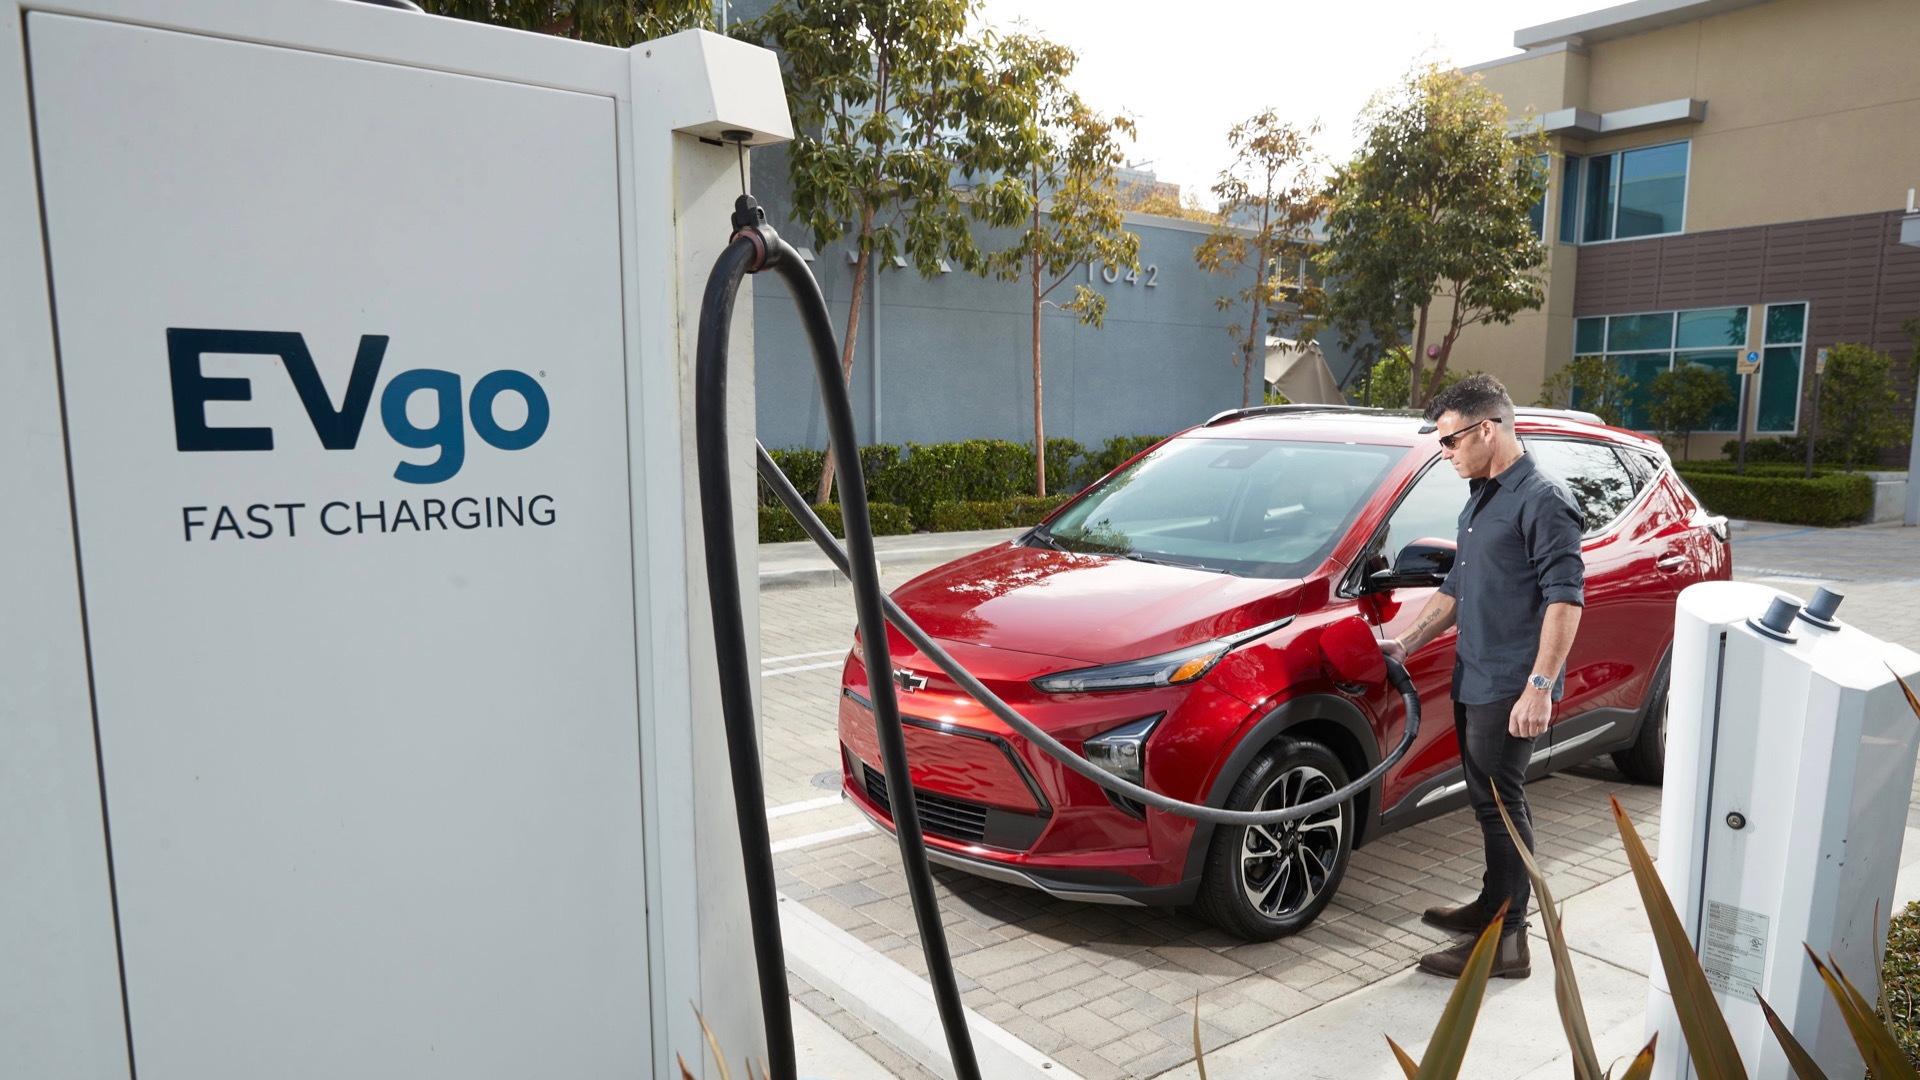 2022 Chevrolet Bolt EUV at EVgo fast-charging station